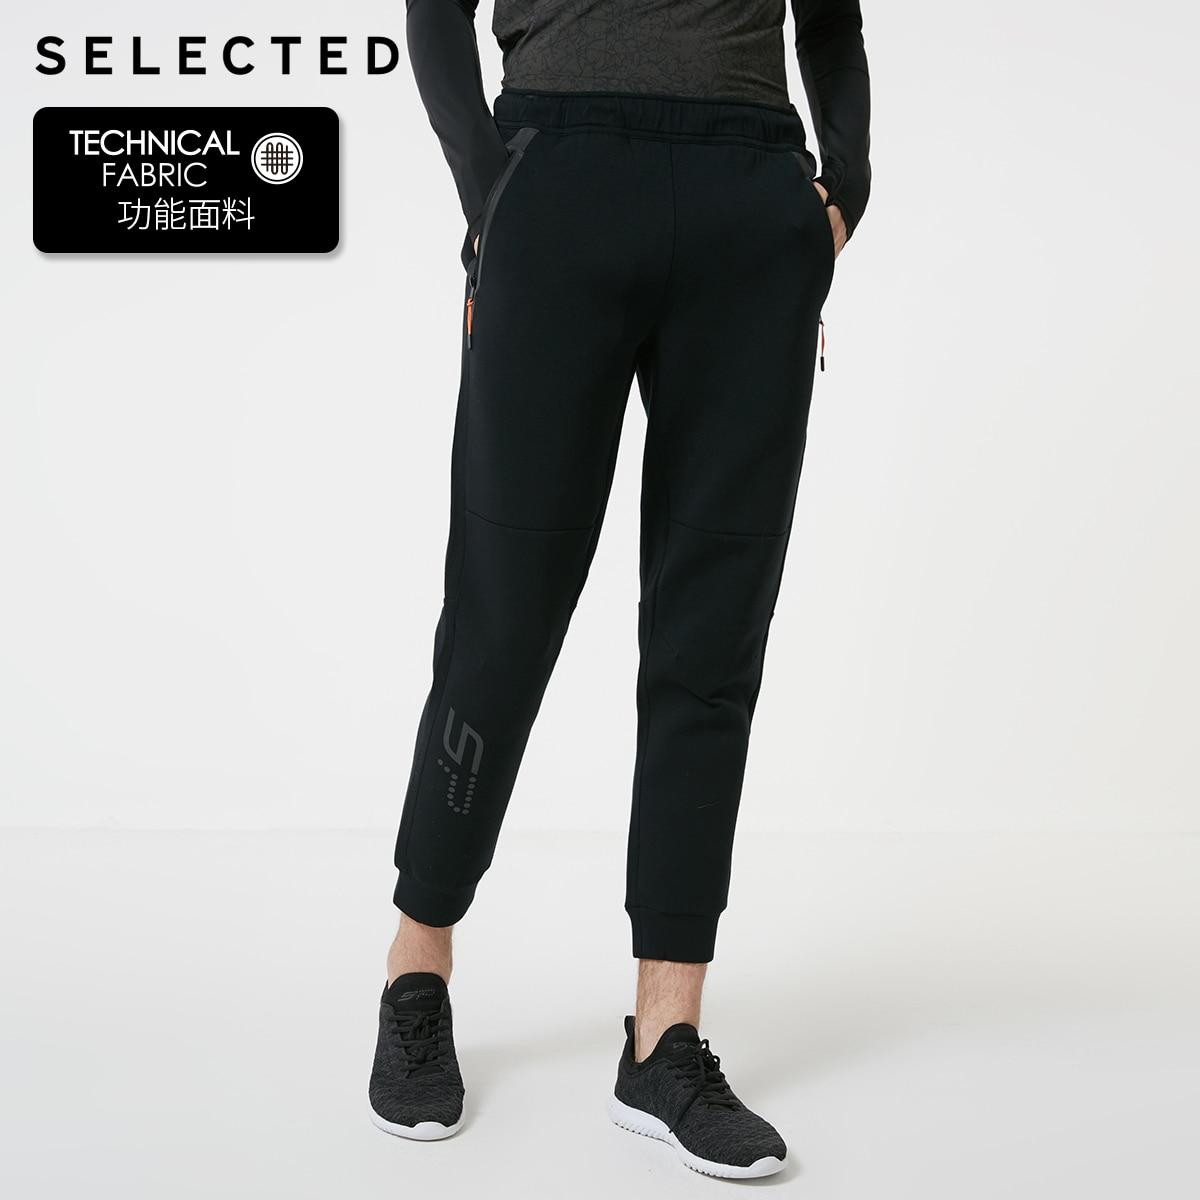 SELECTED Men Autumn Slight Stretch Cotton Ankle-banded Sweatpants SP 419114566